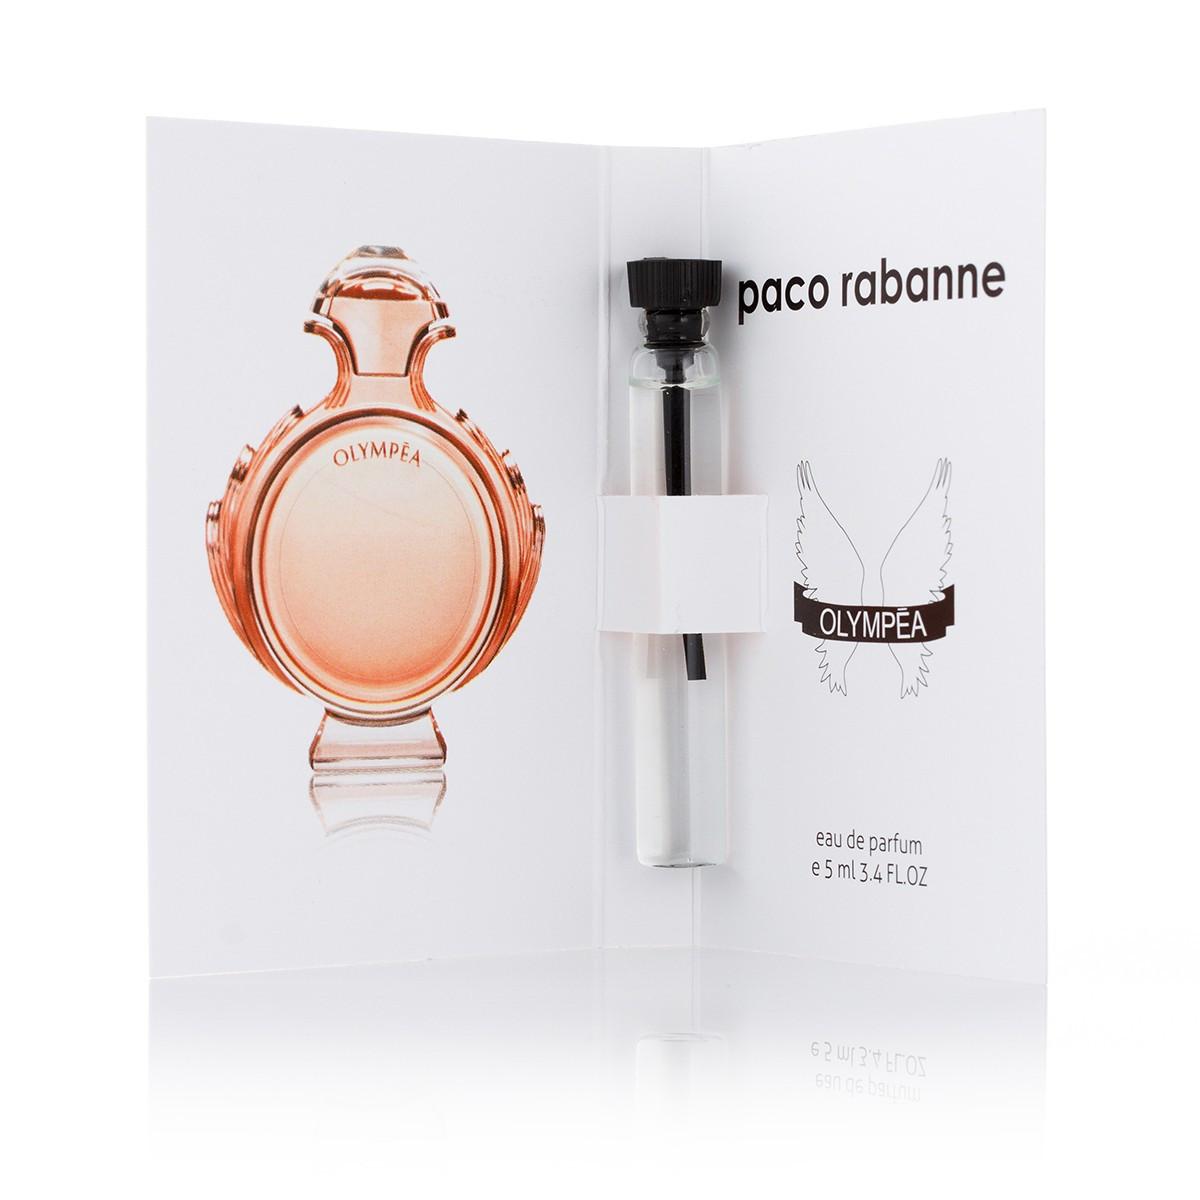 PACO RABANNE Olympea (ж) 5 ml